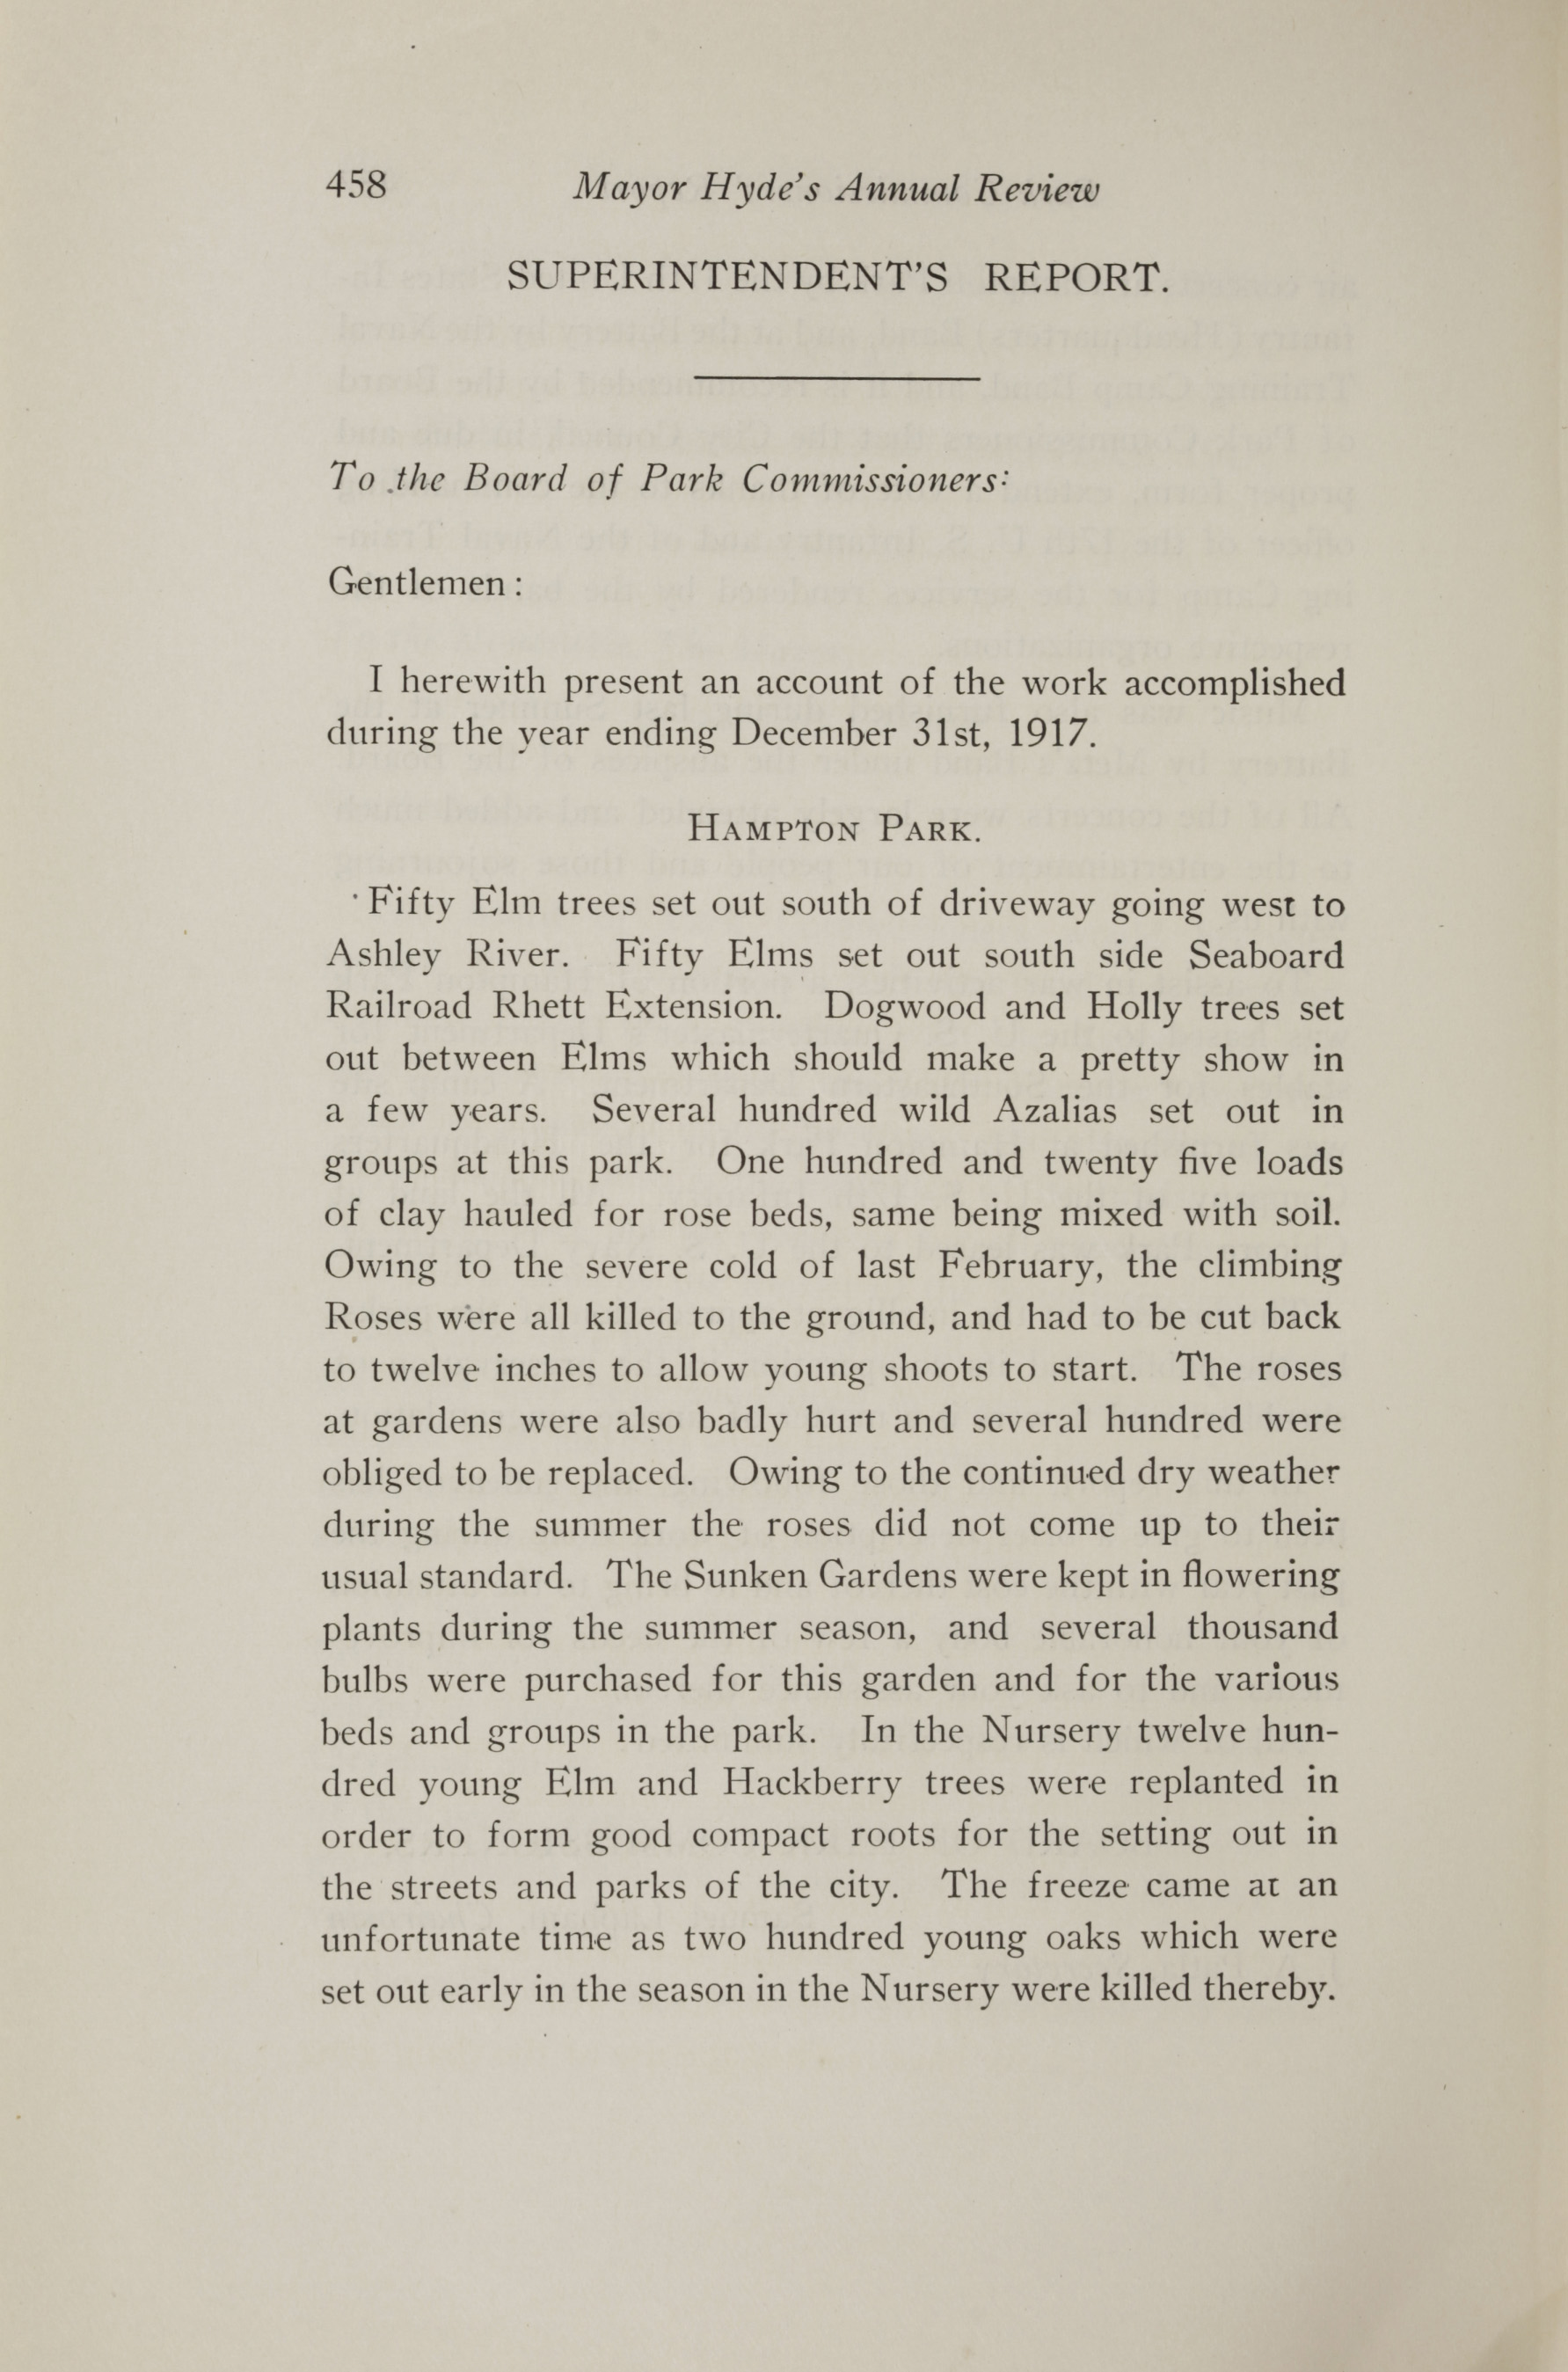 Charleston Yearbook, 1917, page 458